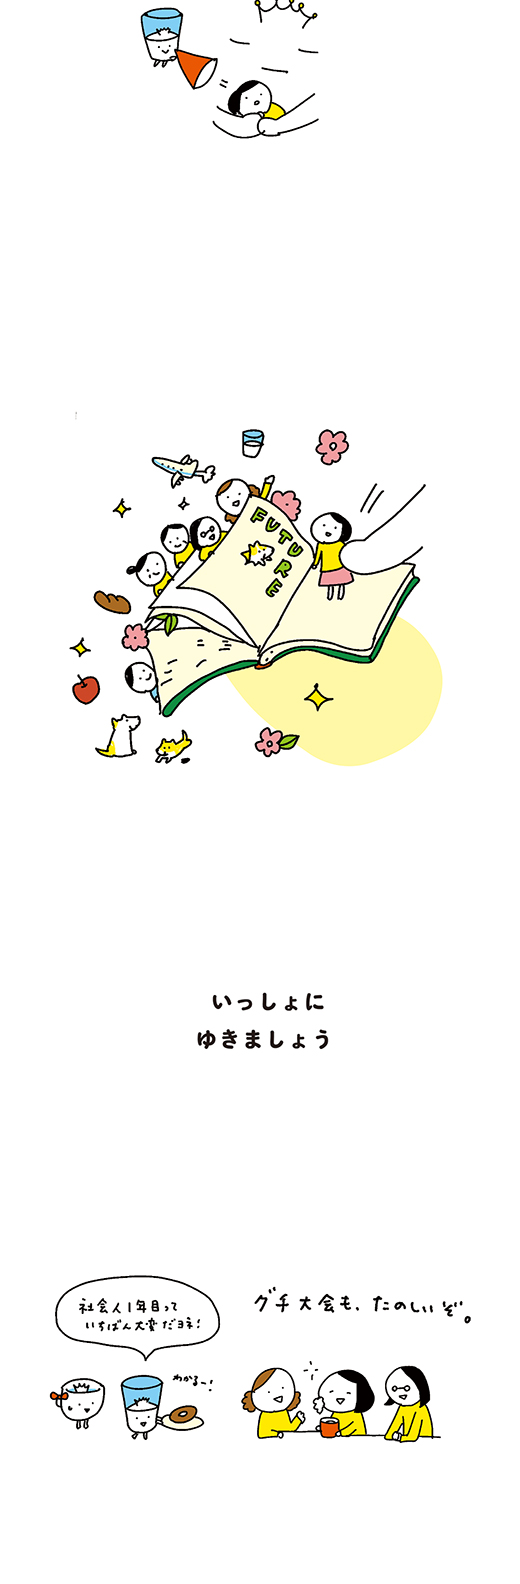 191127_kotaete_04